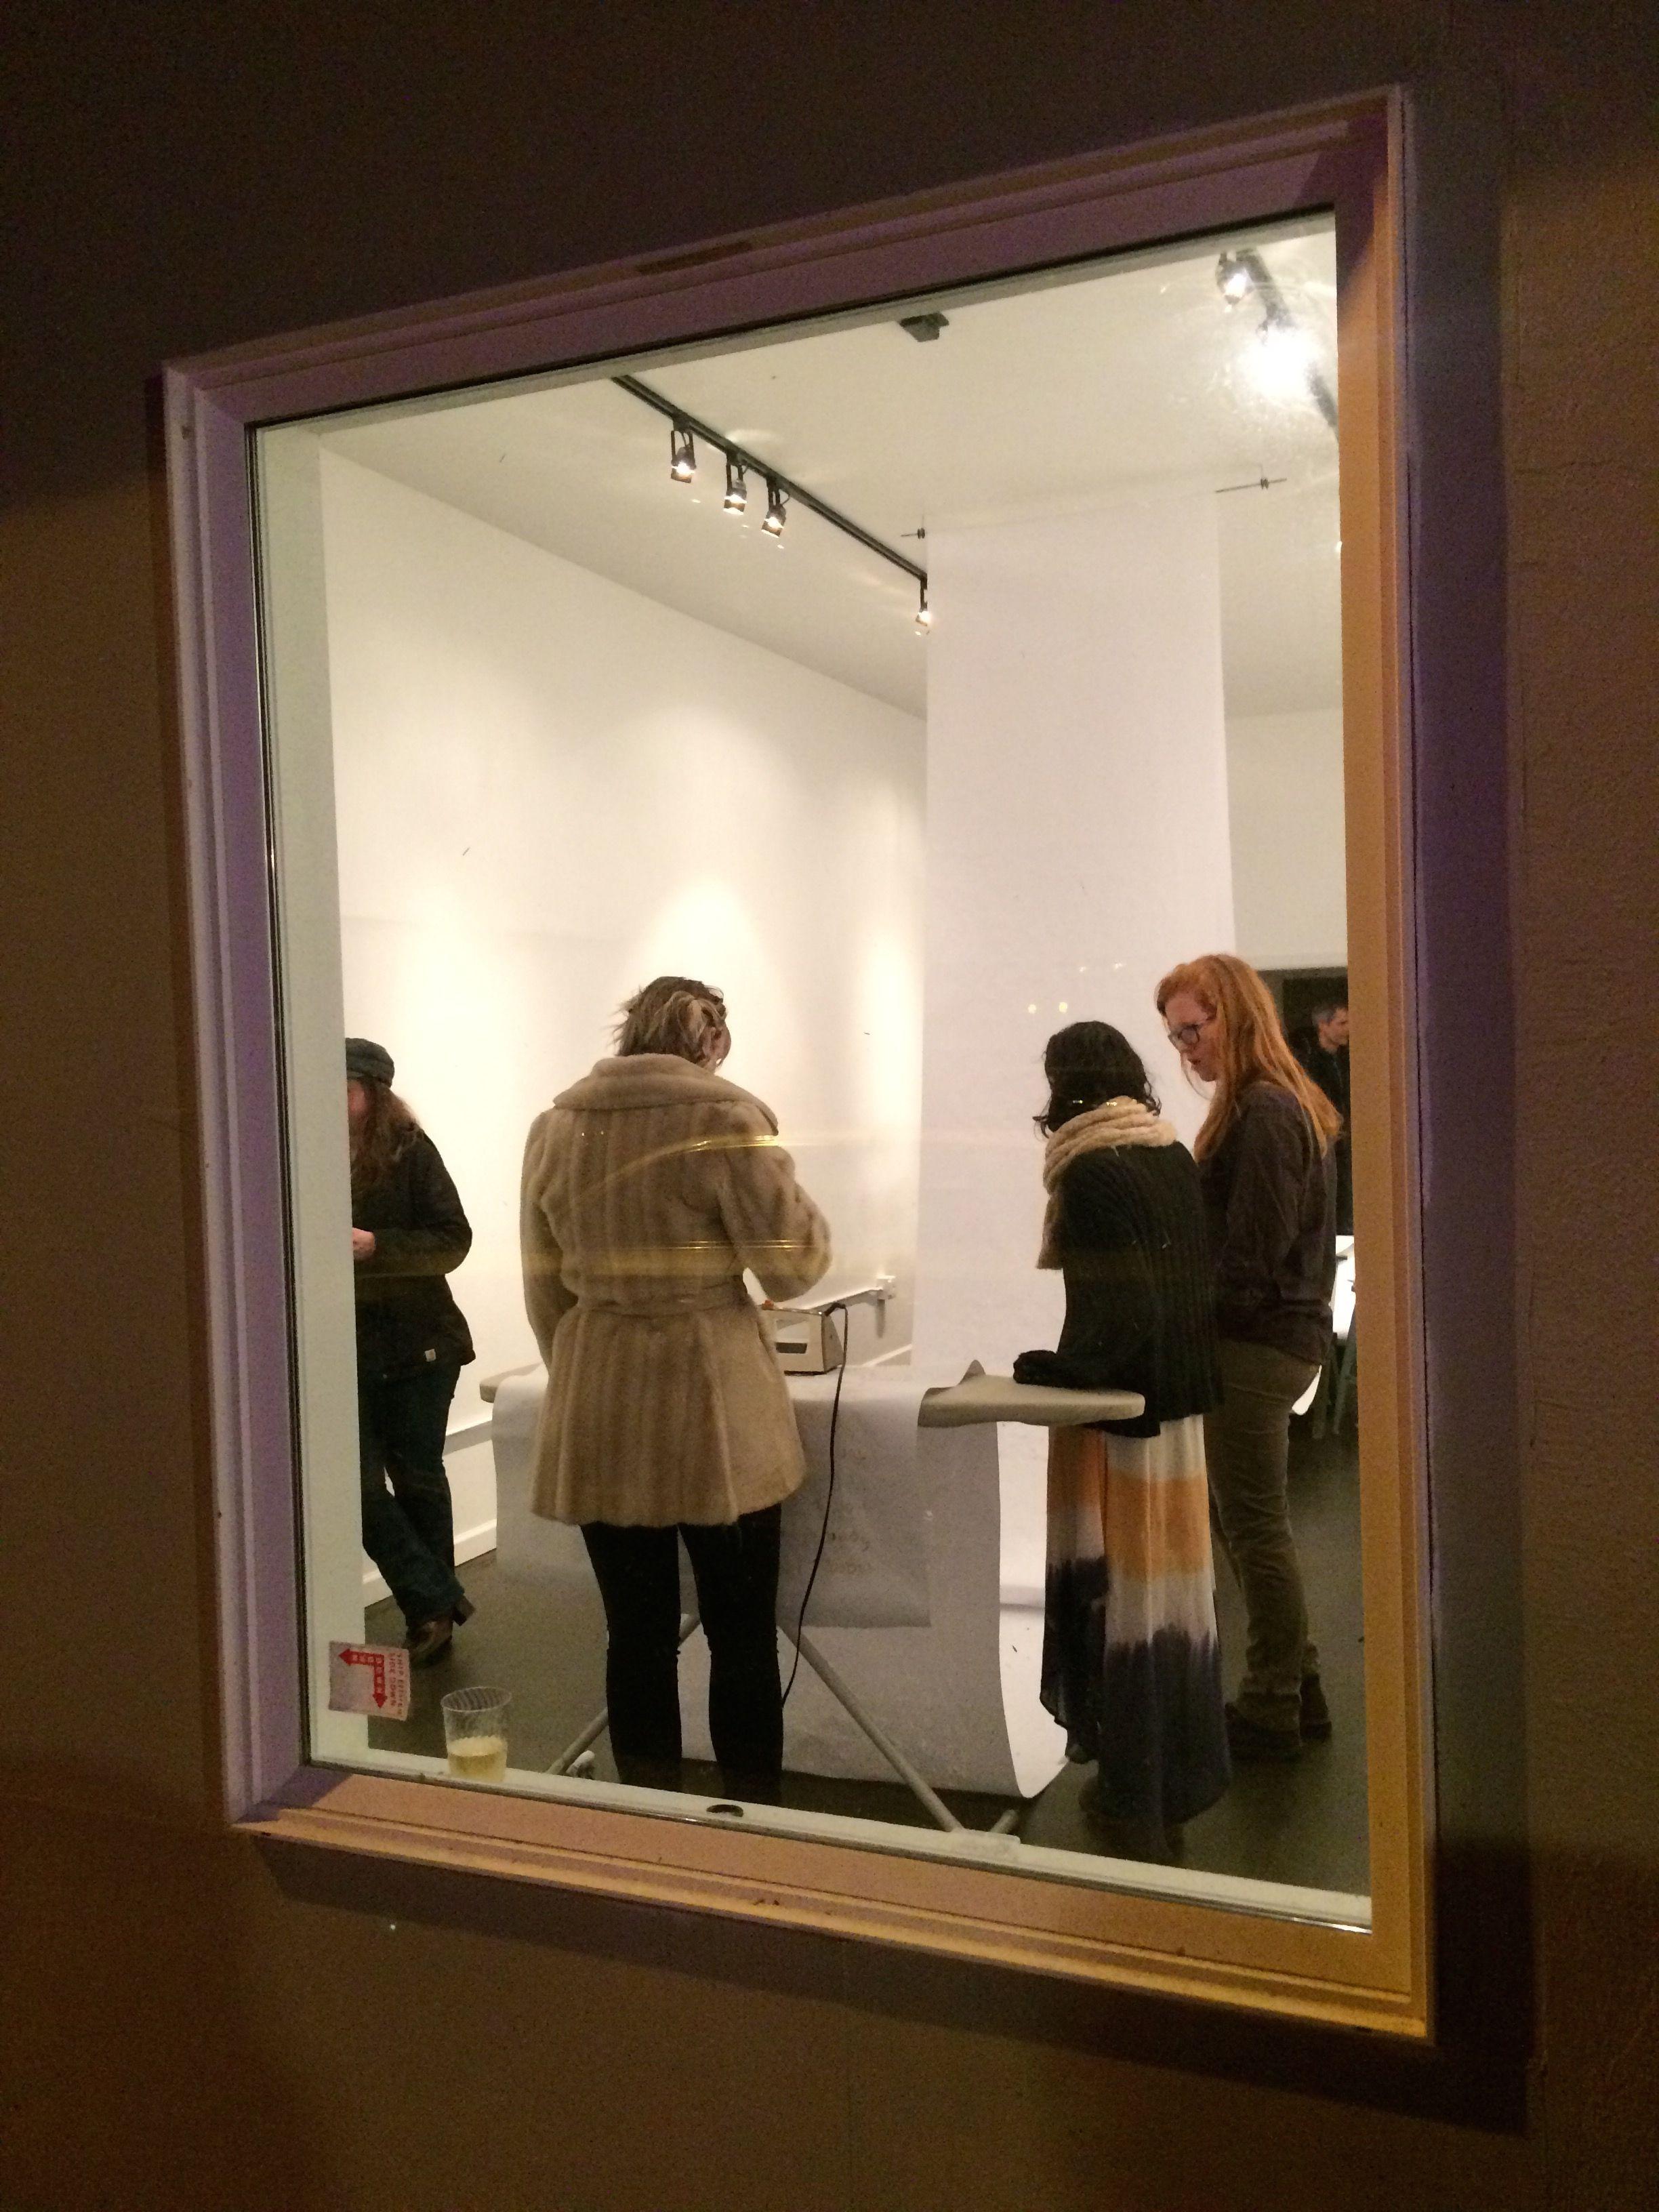 Installation reception - participant ironing